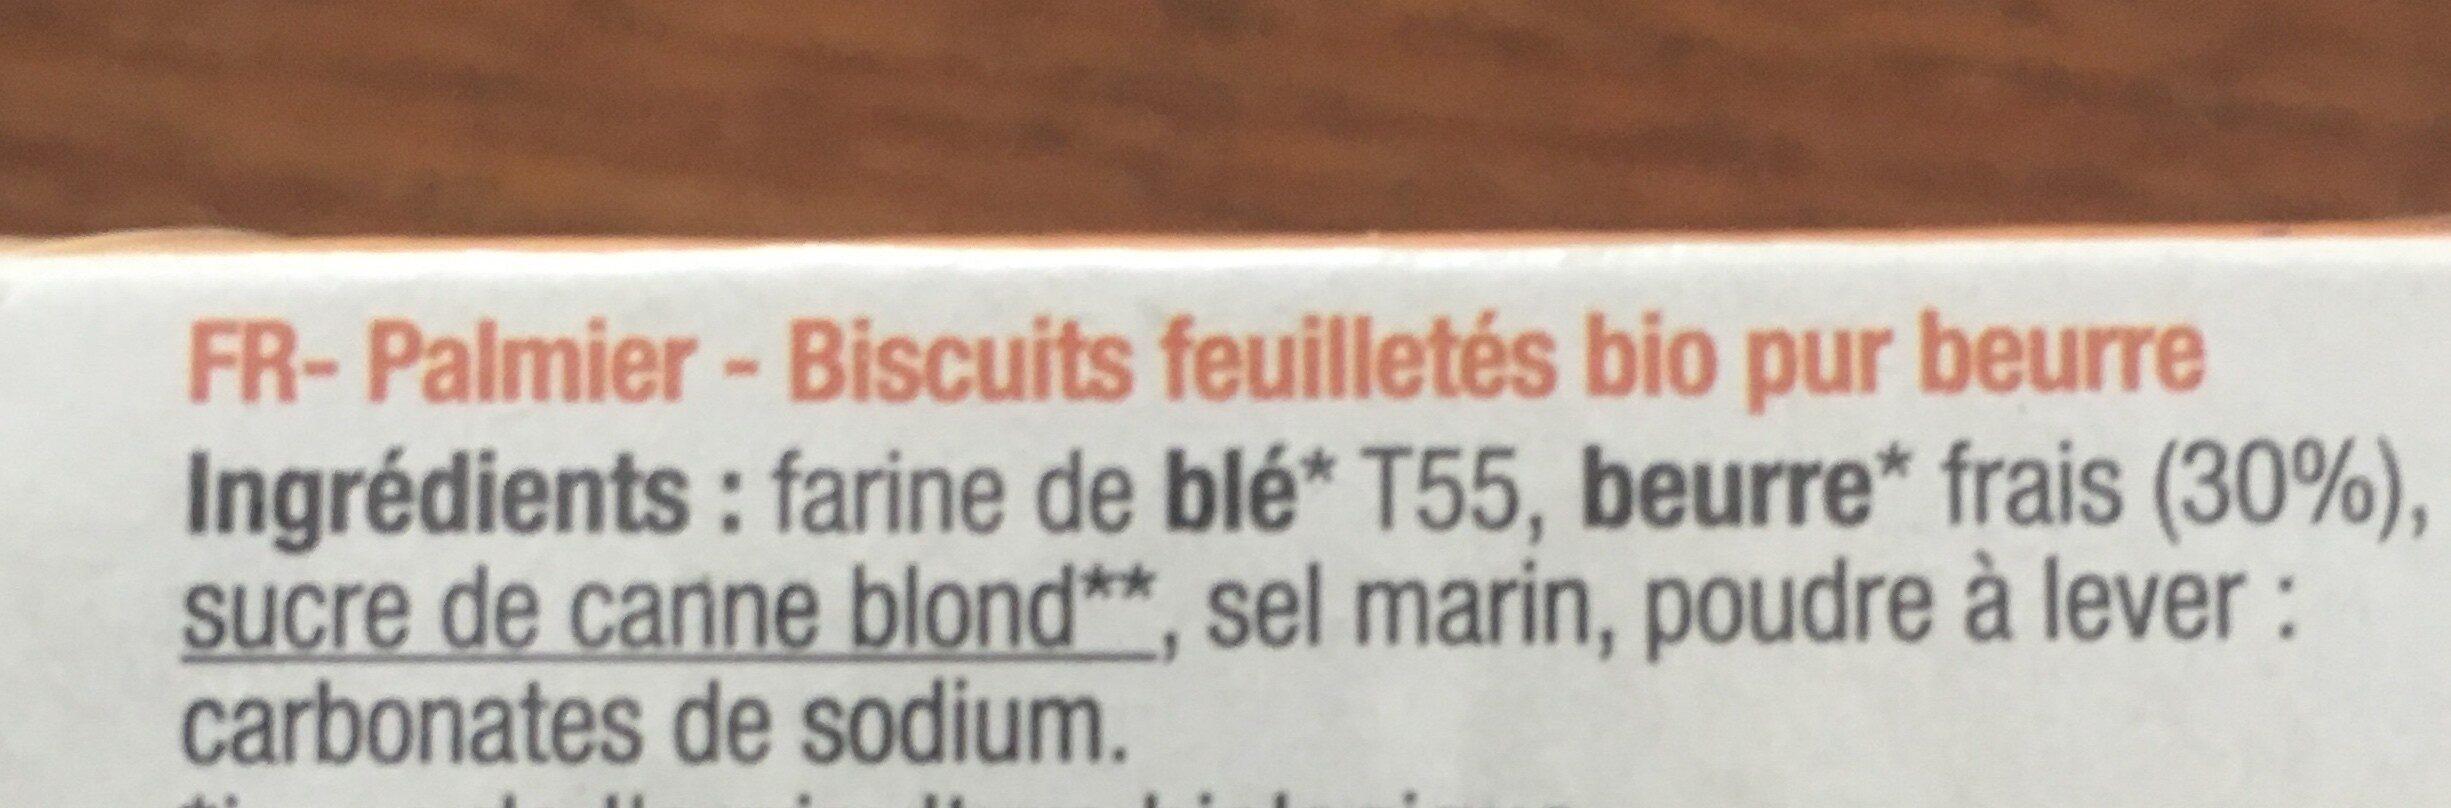 Palmier Pur beurre Nature - Ingredients